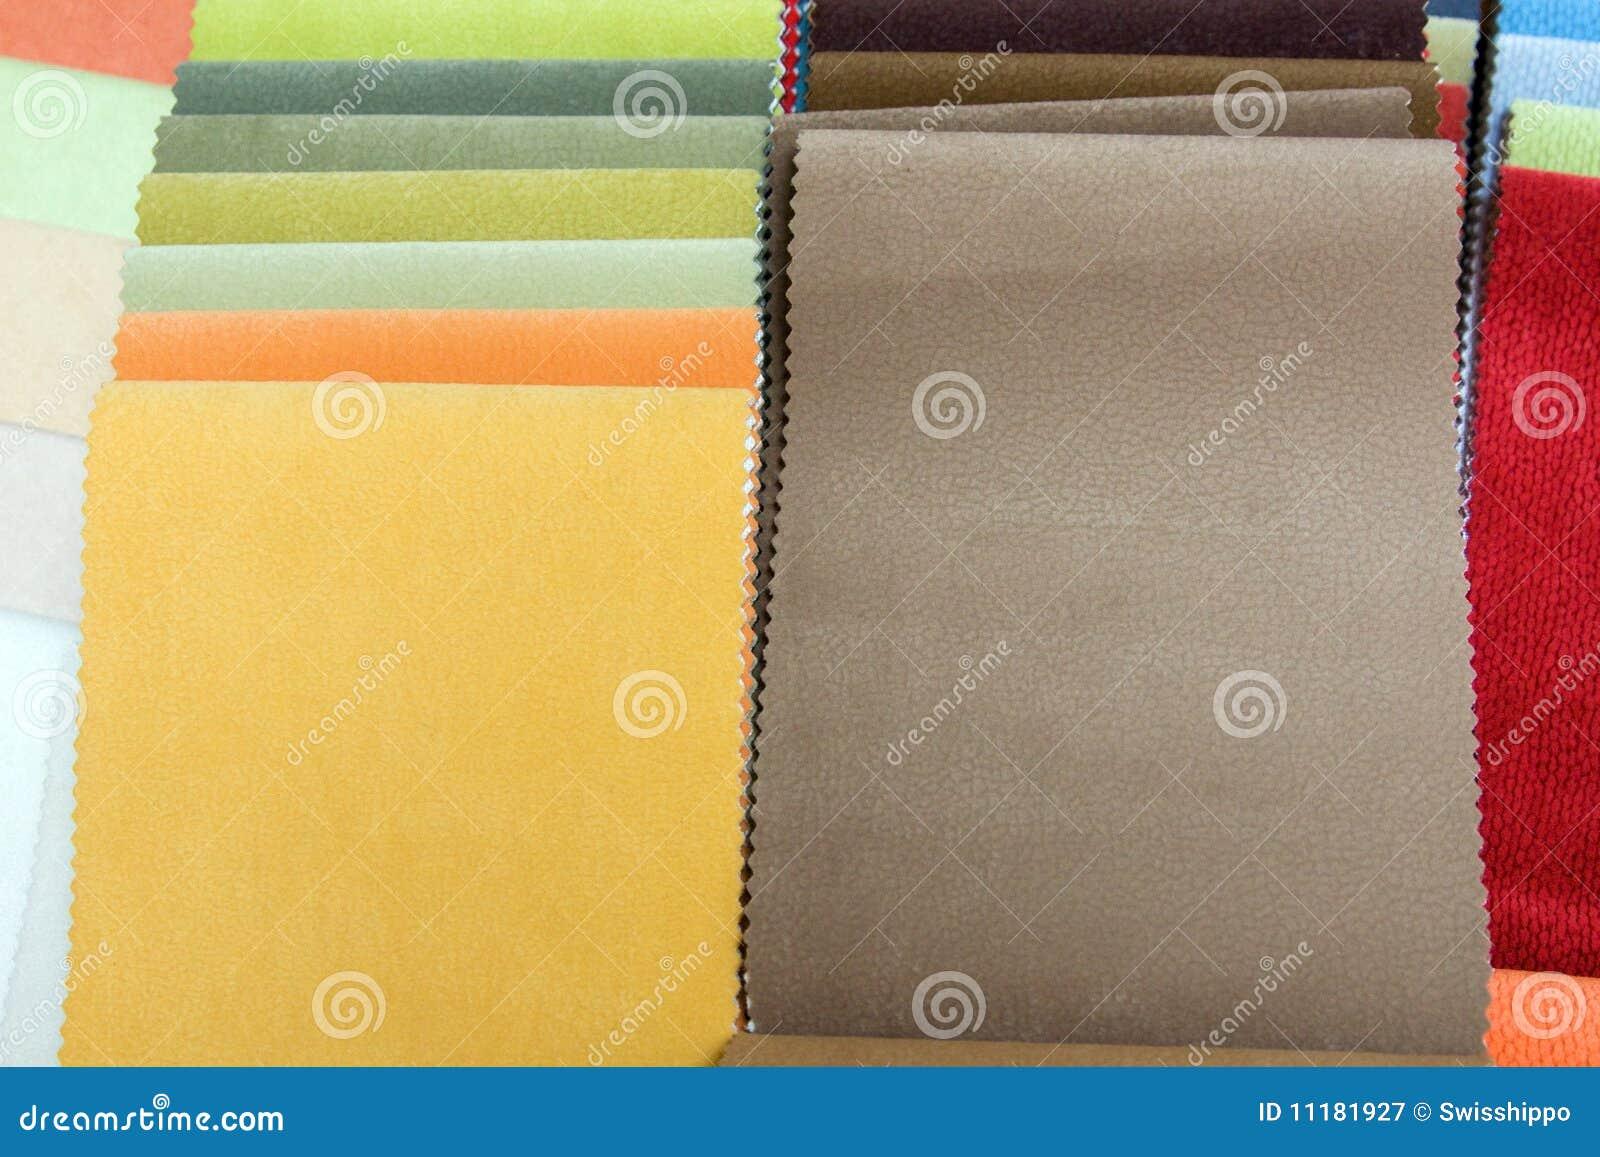 Samples upholstery